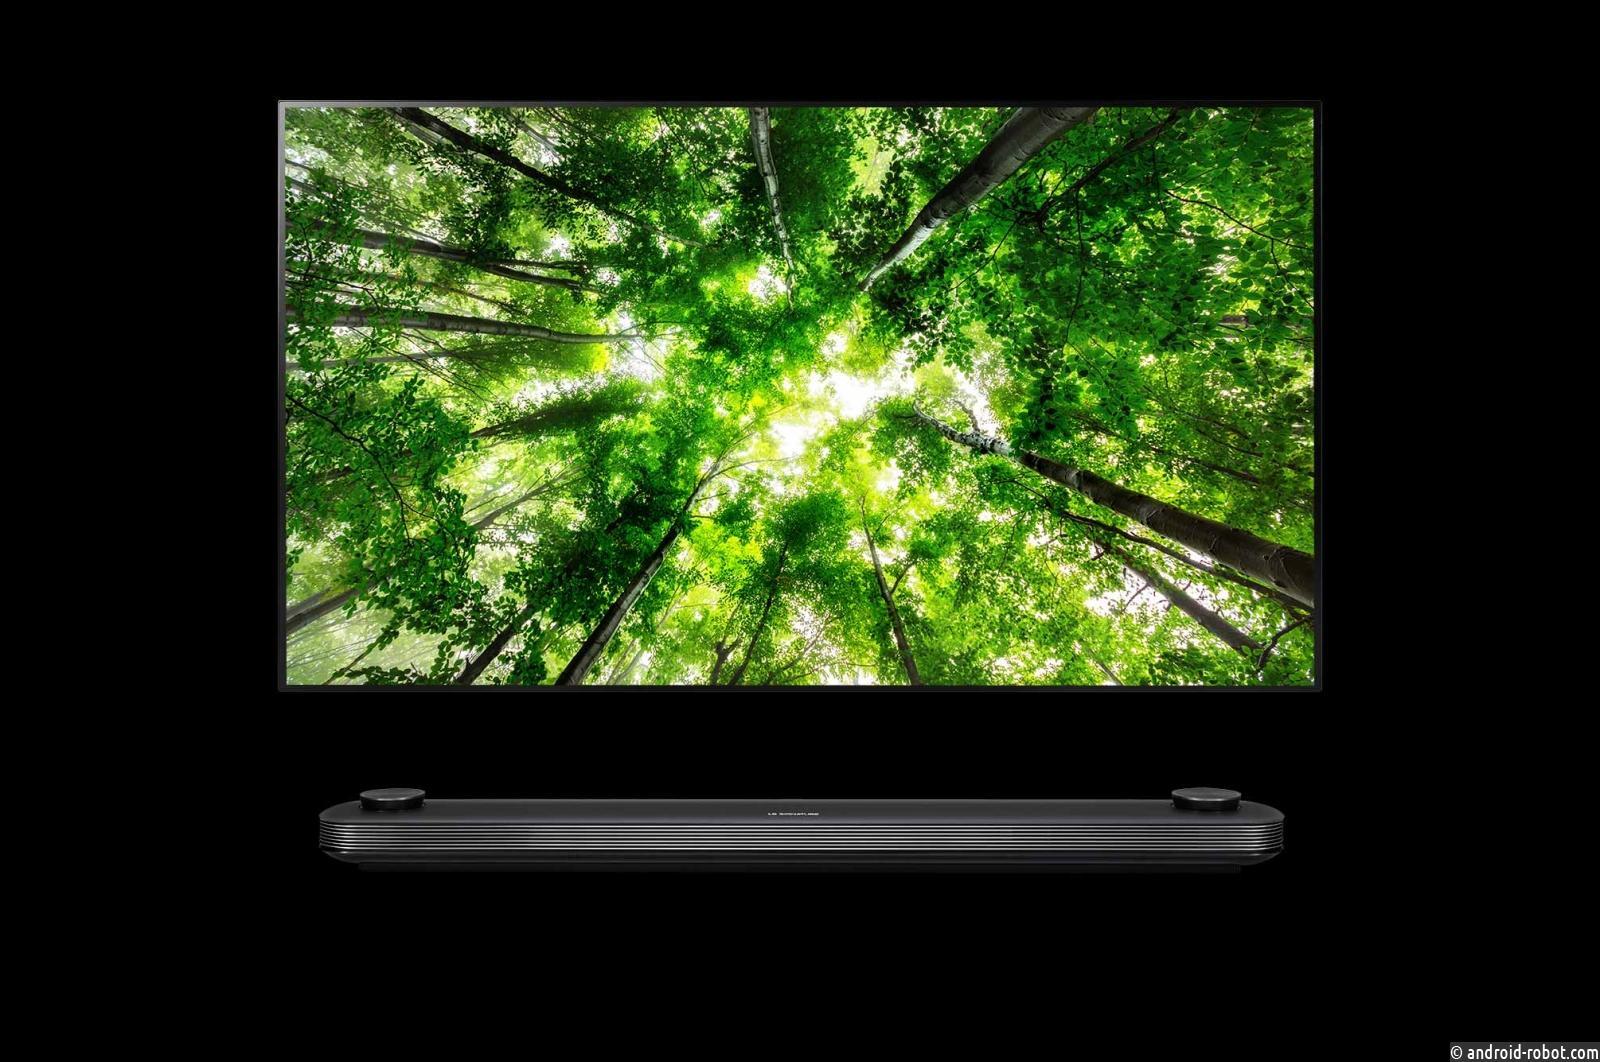 LG представляет уникальный OLED телевизор LG OLED77W8V